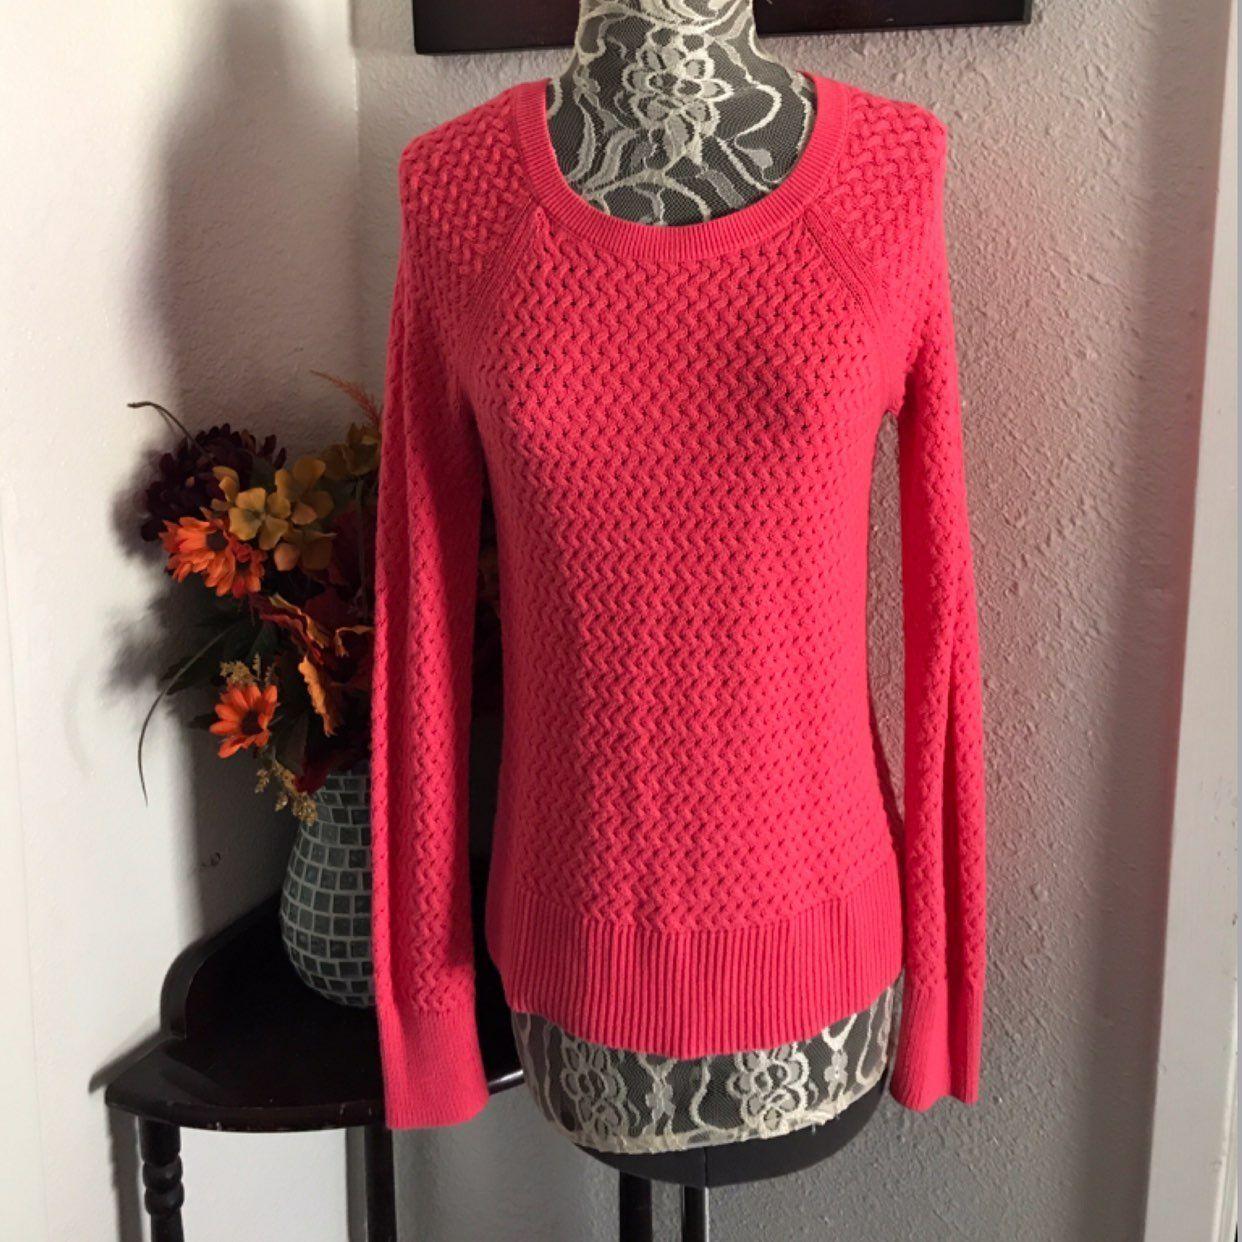 AE Pink Sweater W/ Back Zipper - Mercari: BUY & SELL THINGS YOU LOVE